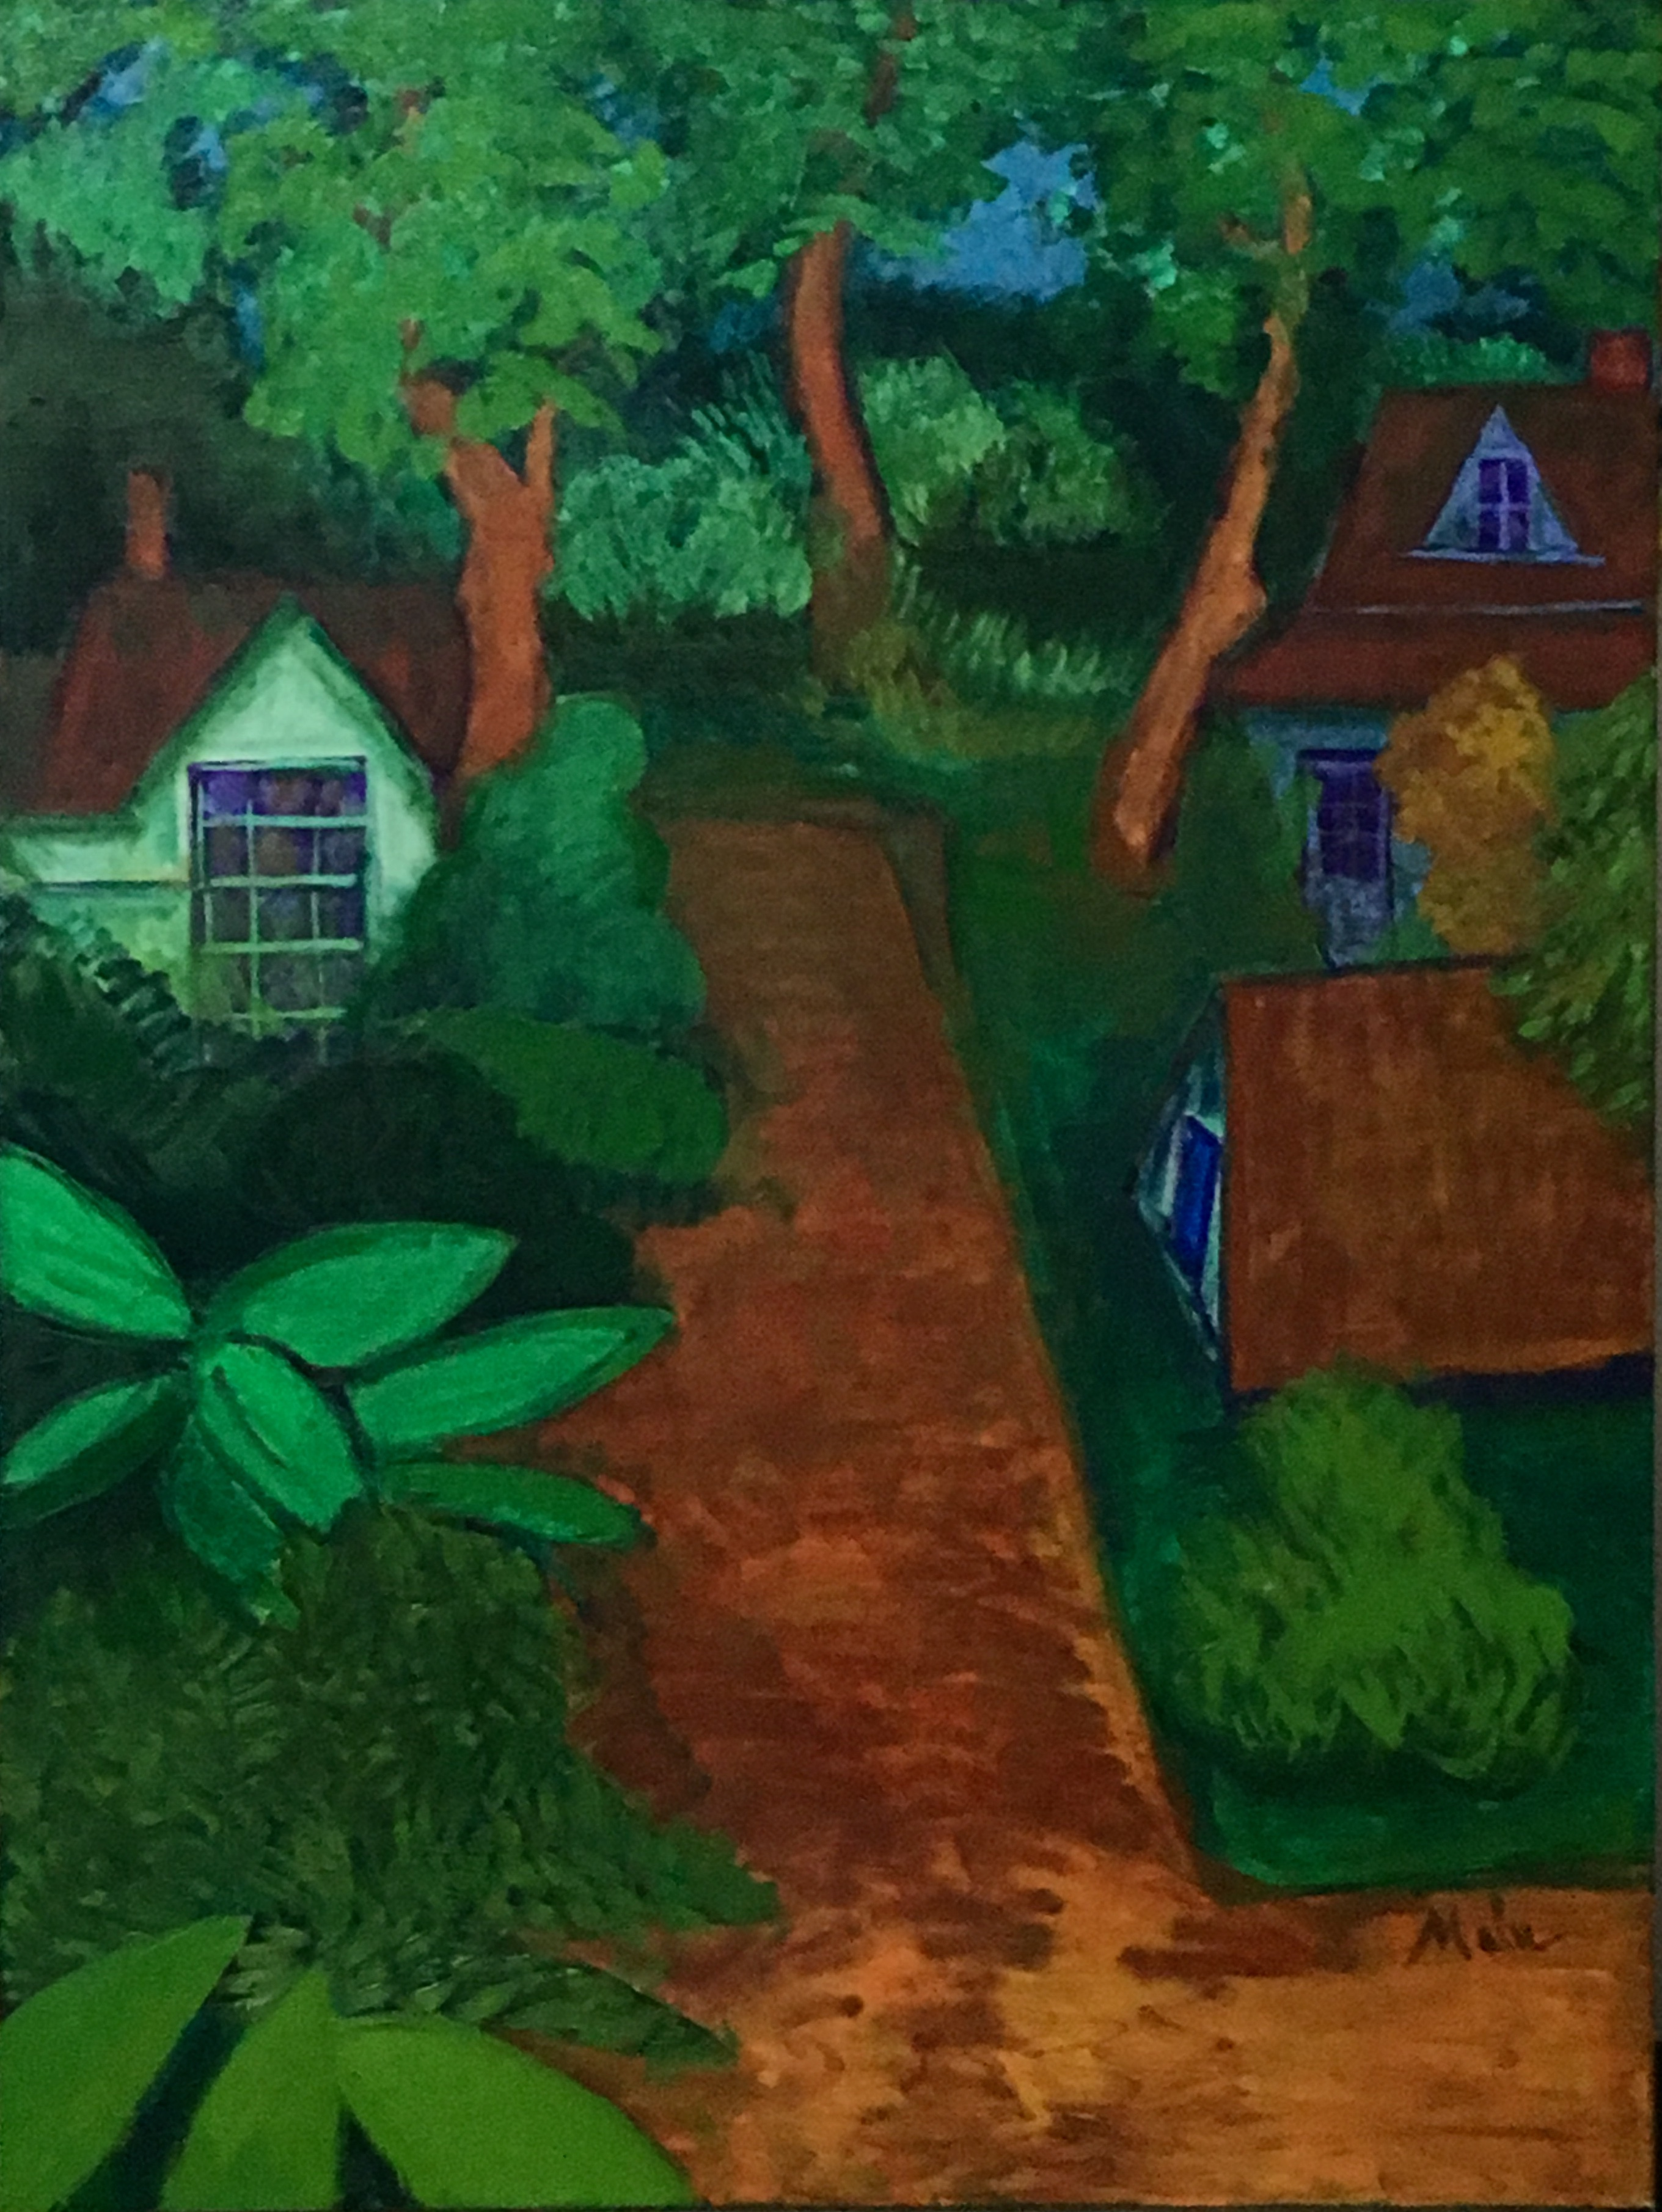 O Jardim The Garden artwork by Malu Ribeiro - art listed for sale on Artplode